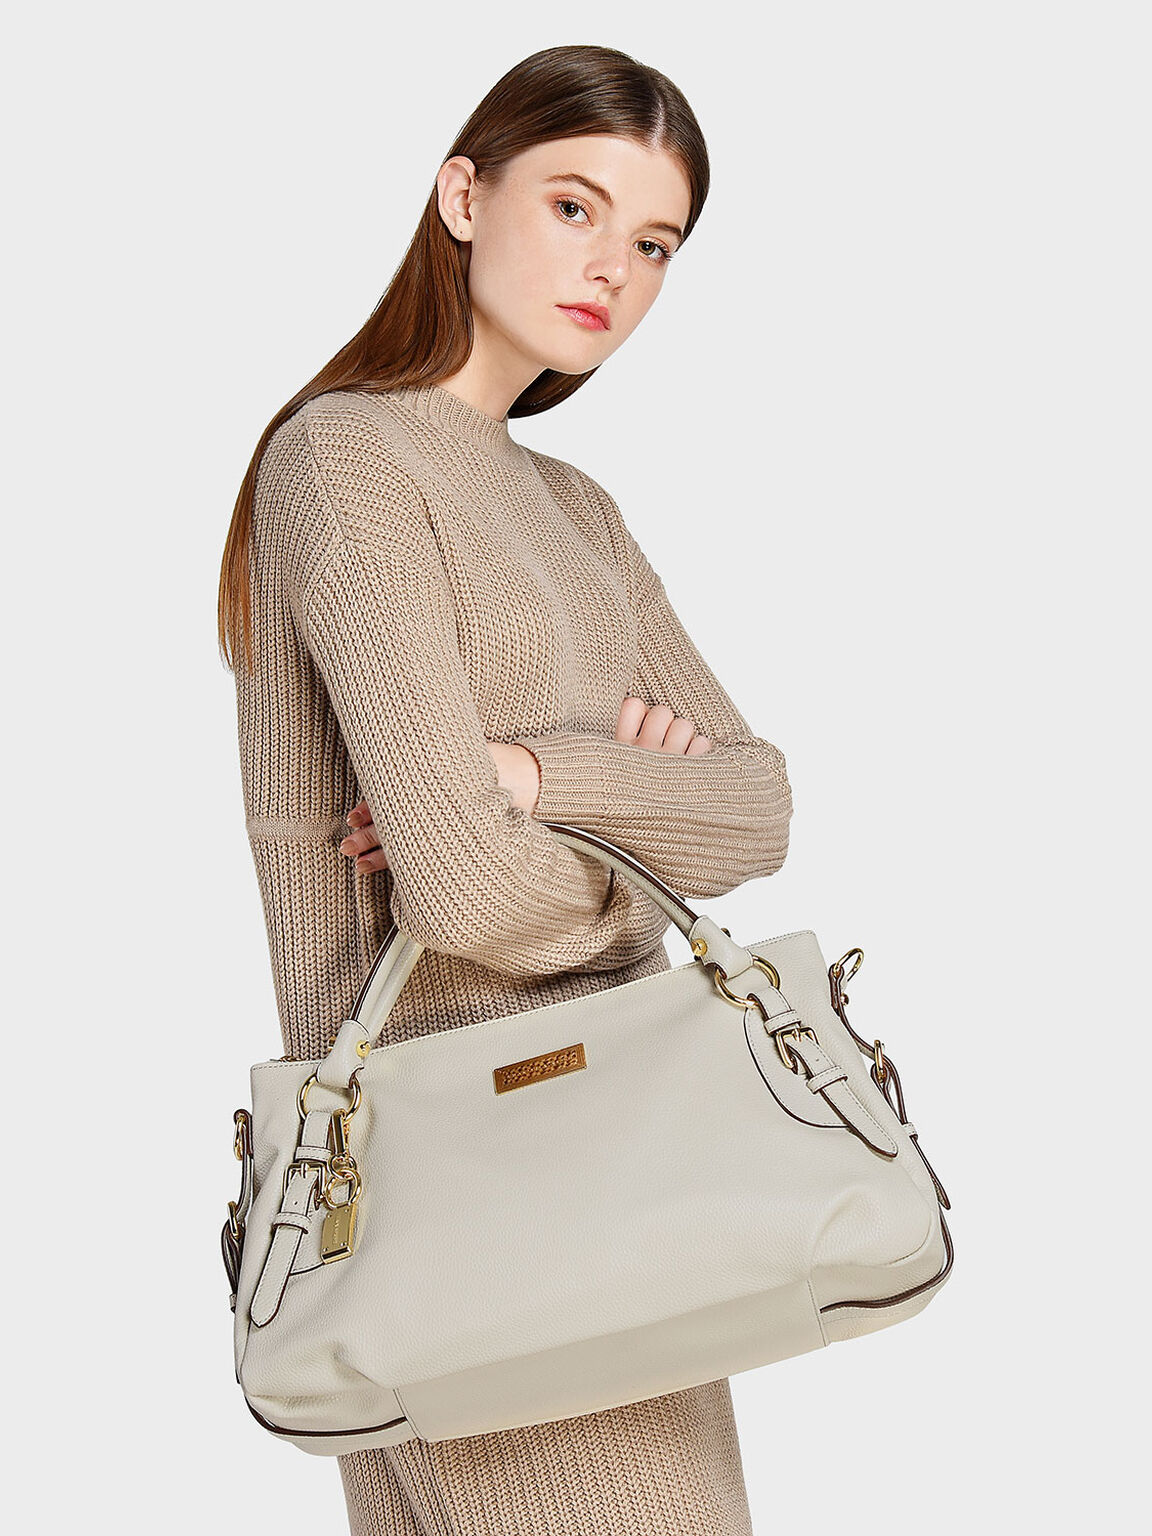 Slouchy Handbag, Beige, hi-res